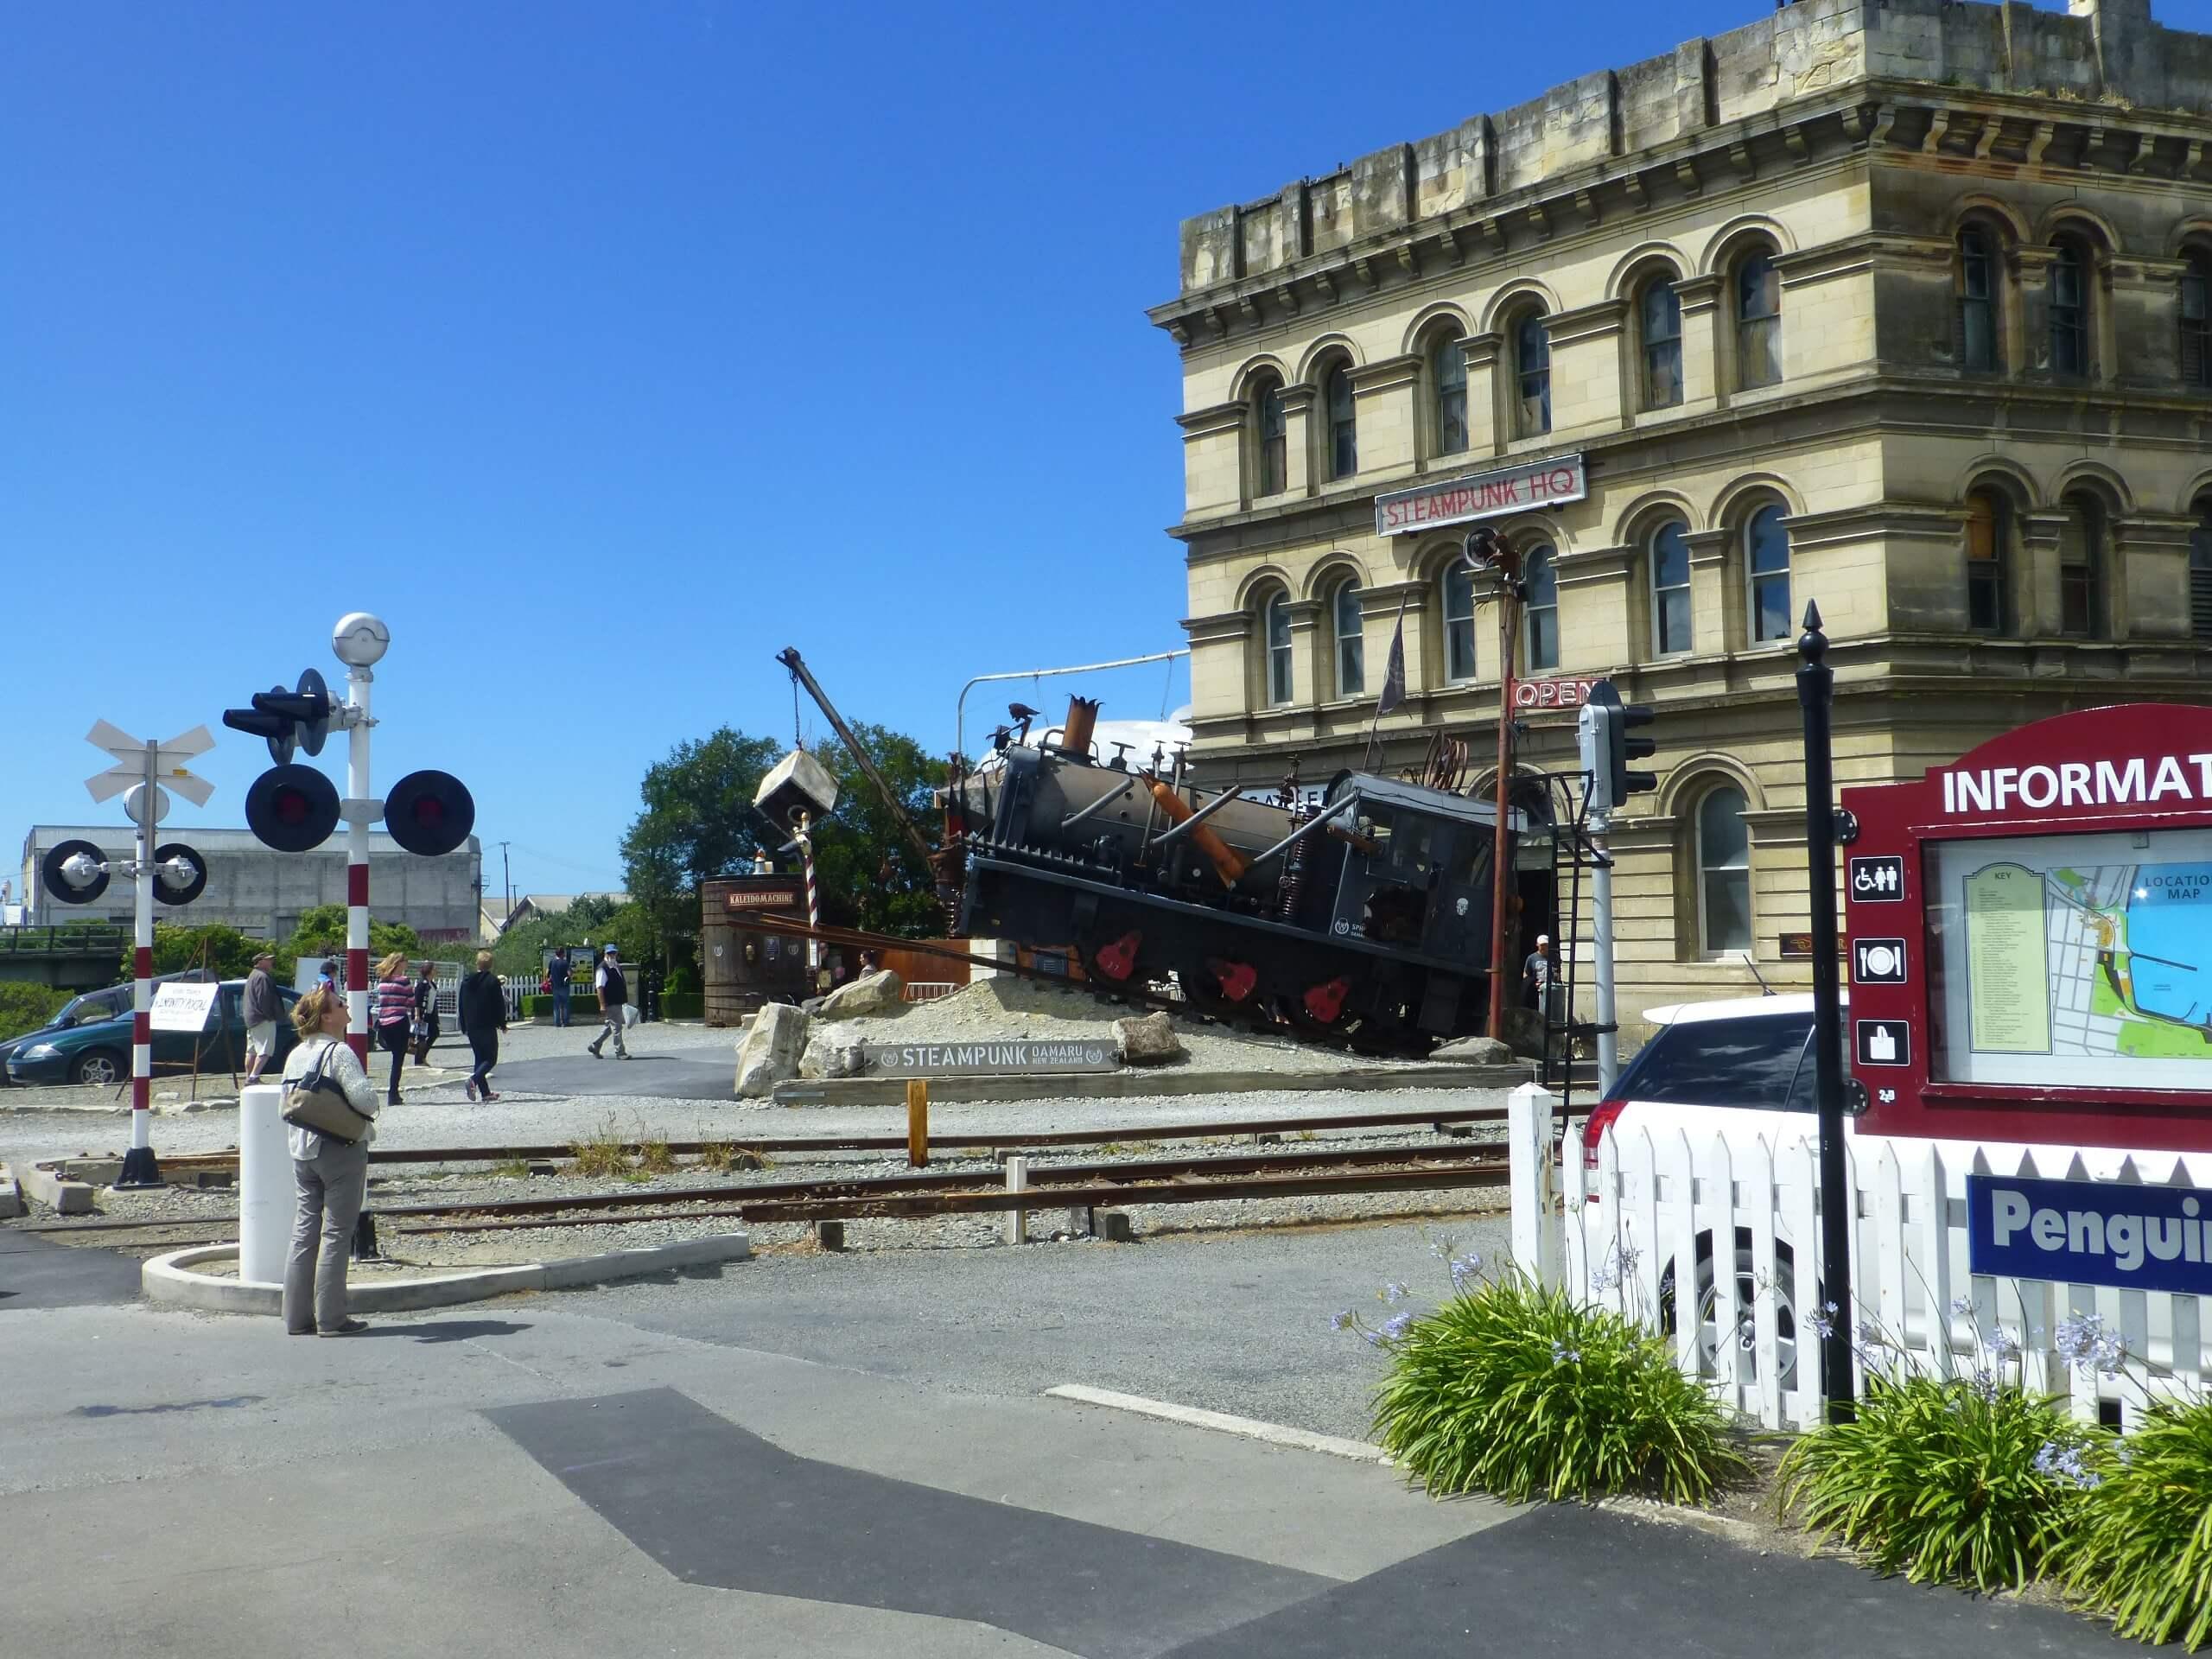 Viktorian Festival in Oamaru 21